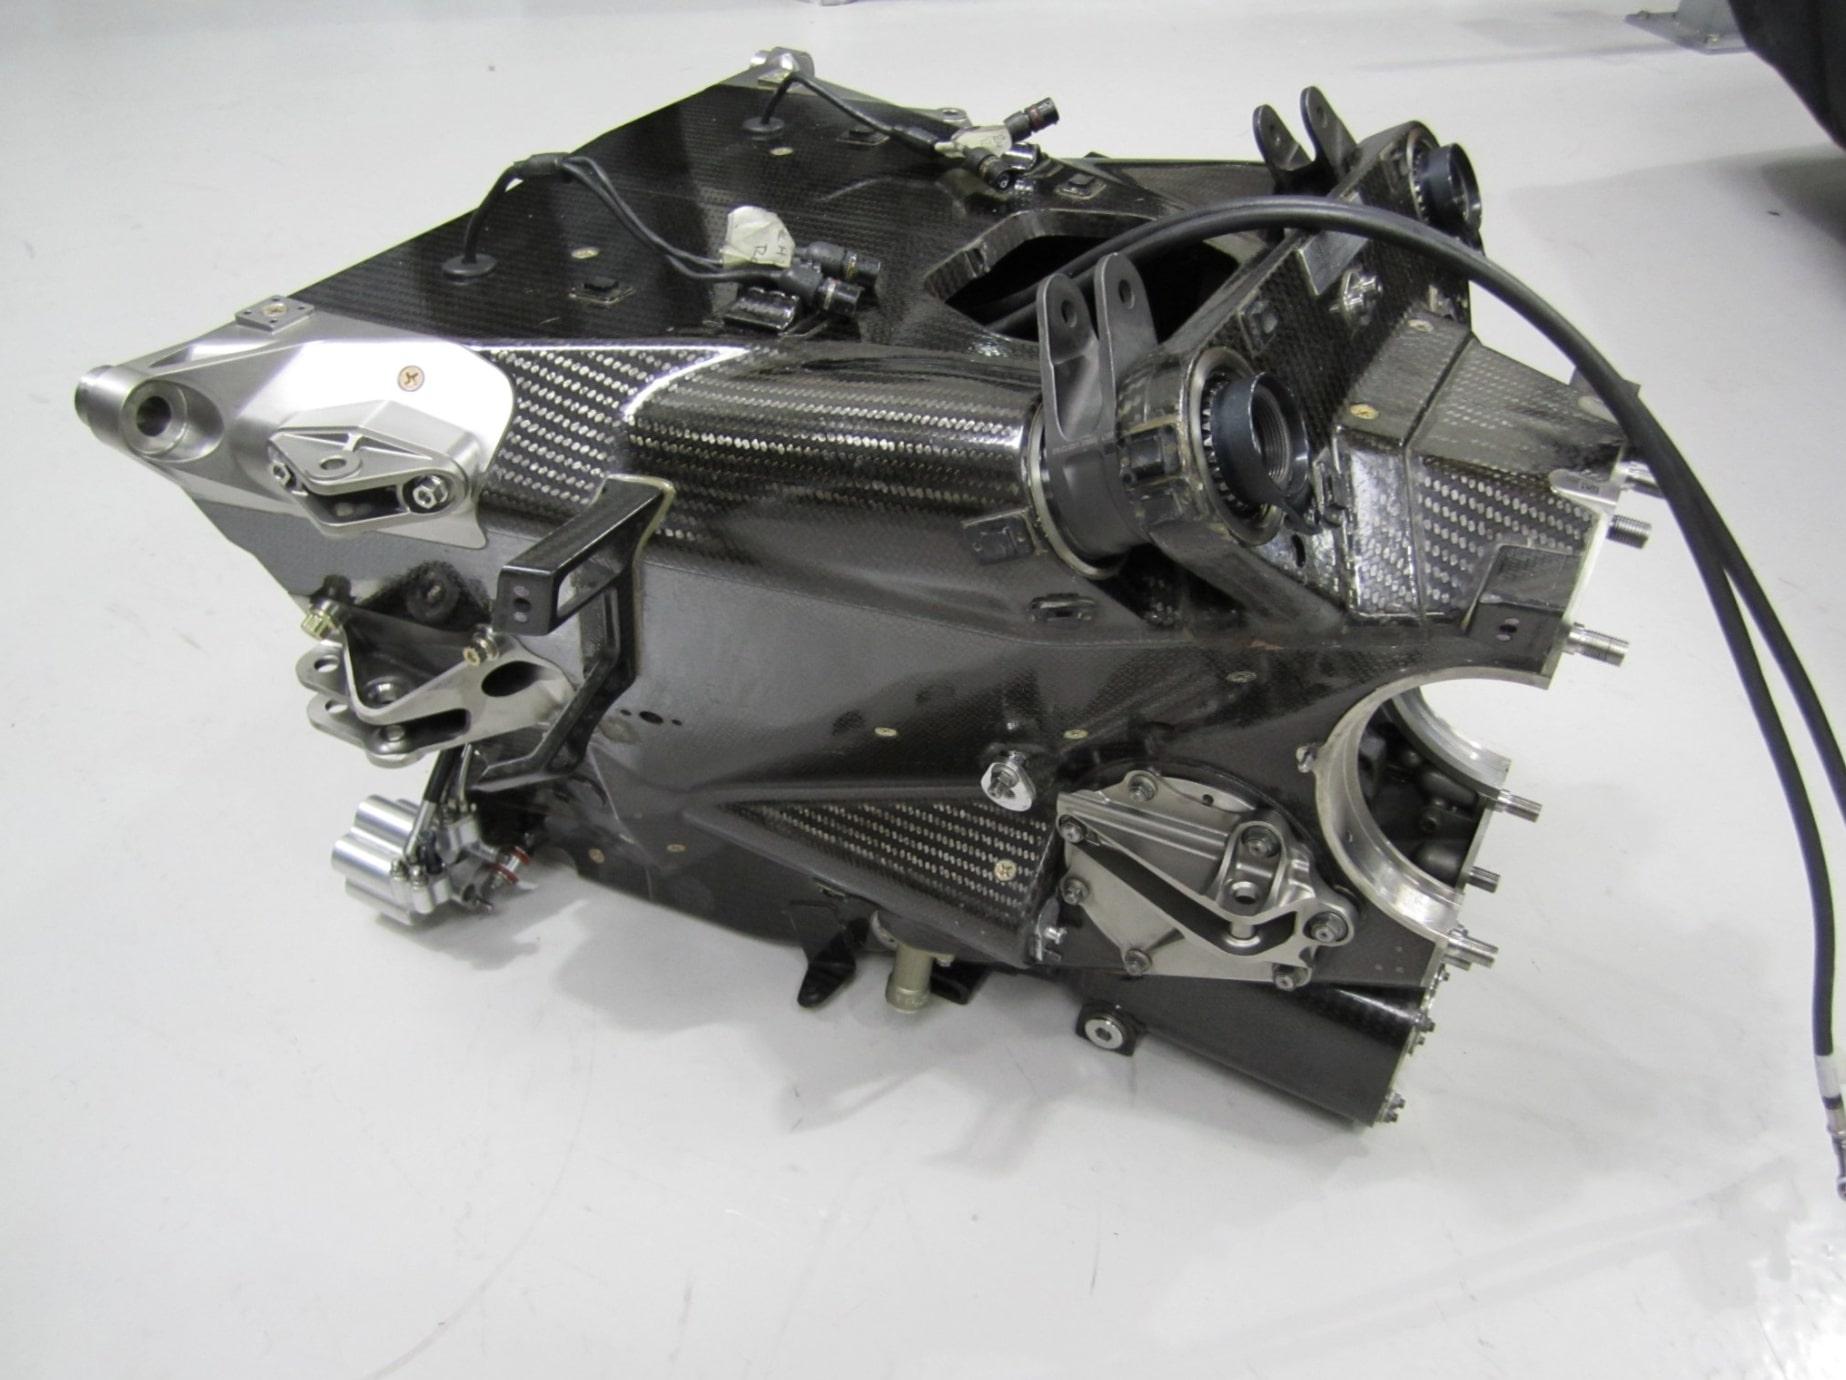 BAR-Honda Bonneville (14)